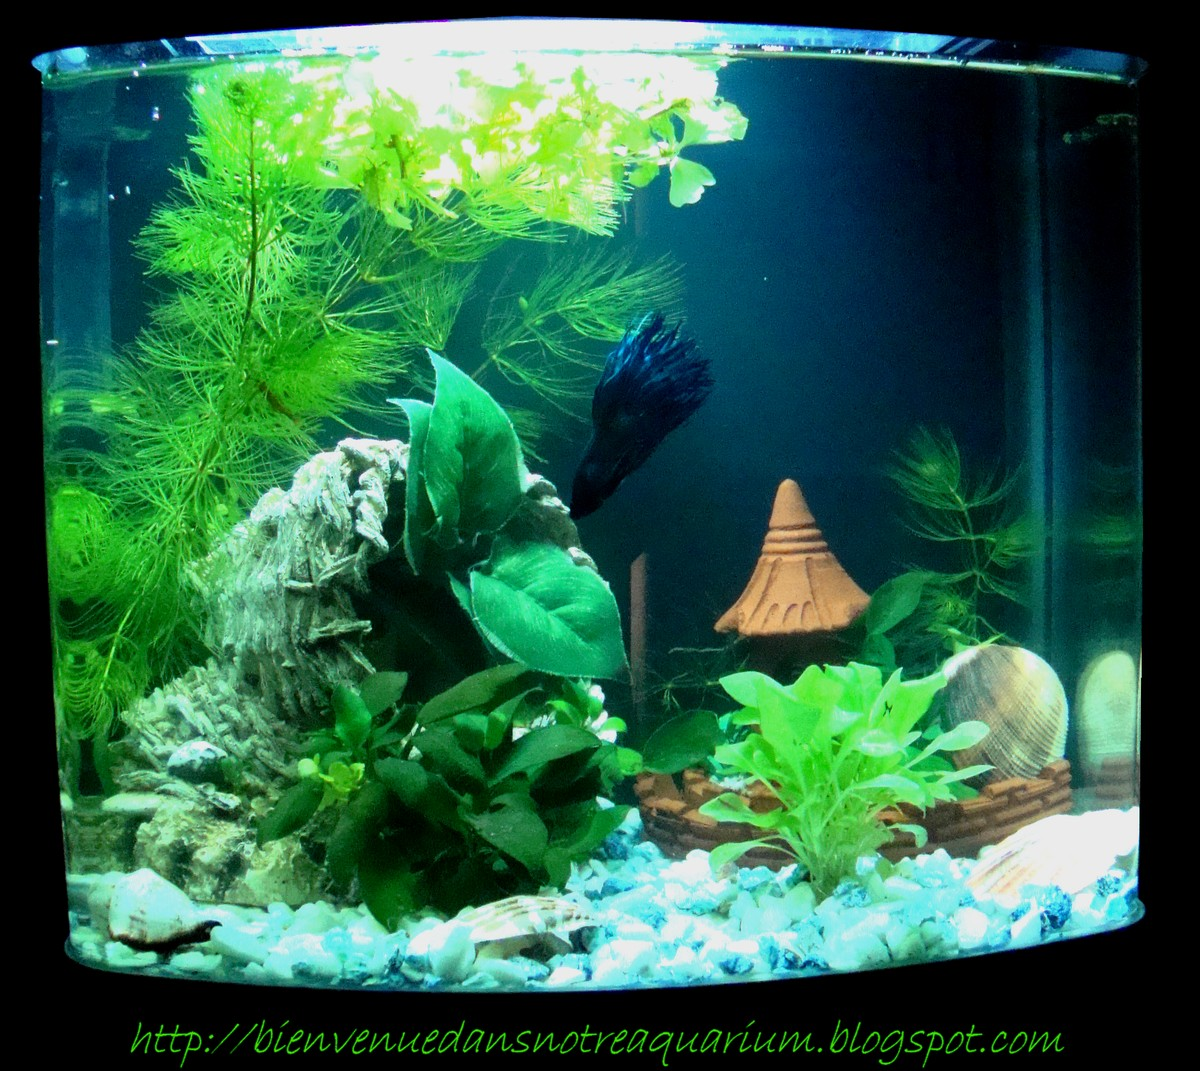 bienvenue dans notre aquarium l 39 aclimatation du betta splendens dnas son joli 24l plant. Black Bedroom Furniture Sets. Home Design Ideas